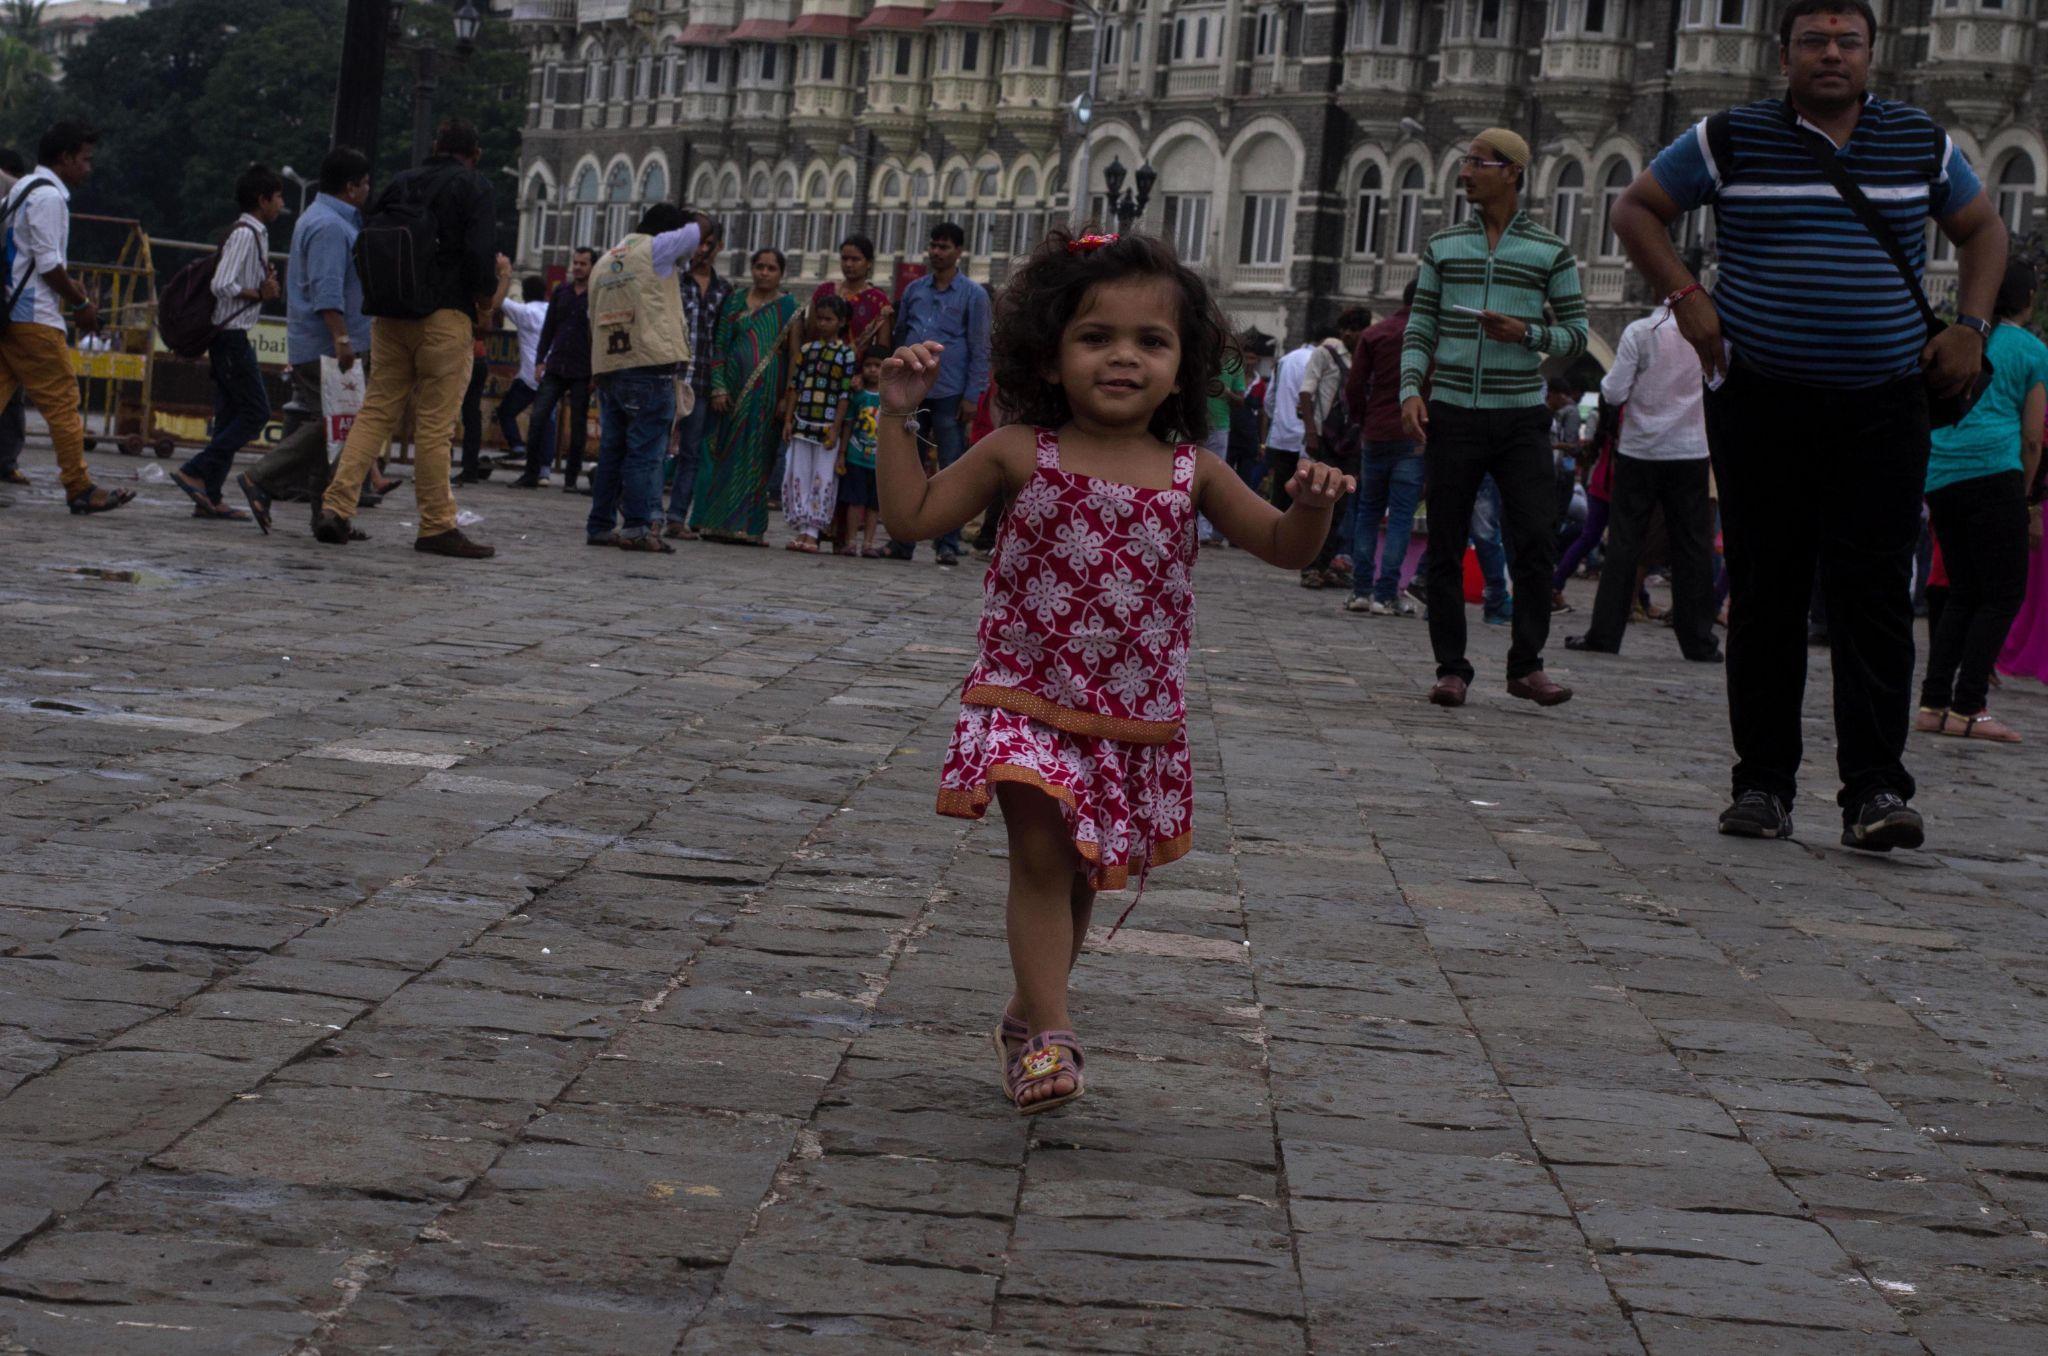 Happiness by Debmalya Choudhuri